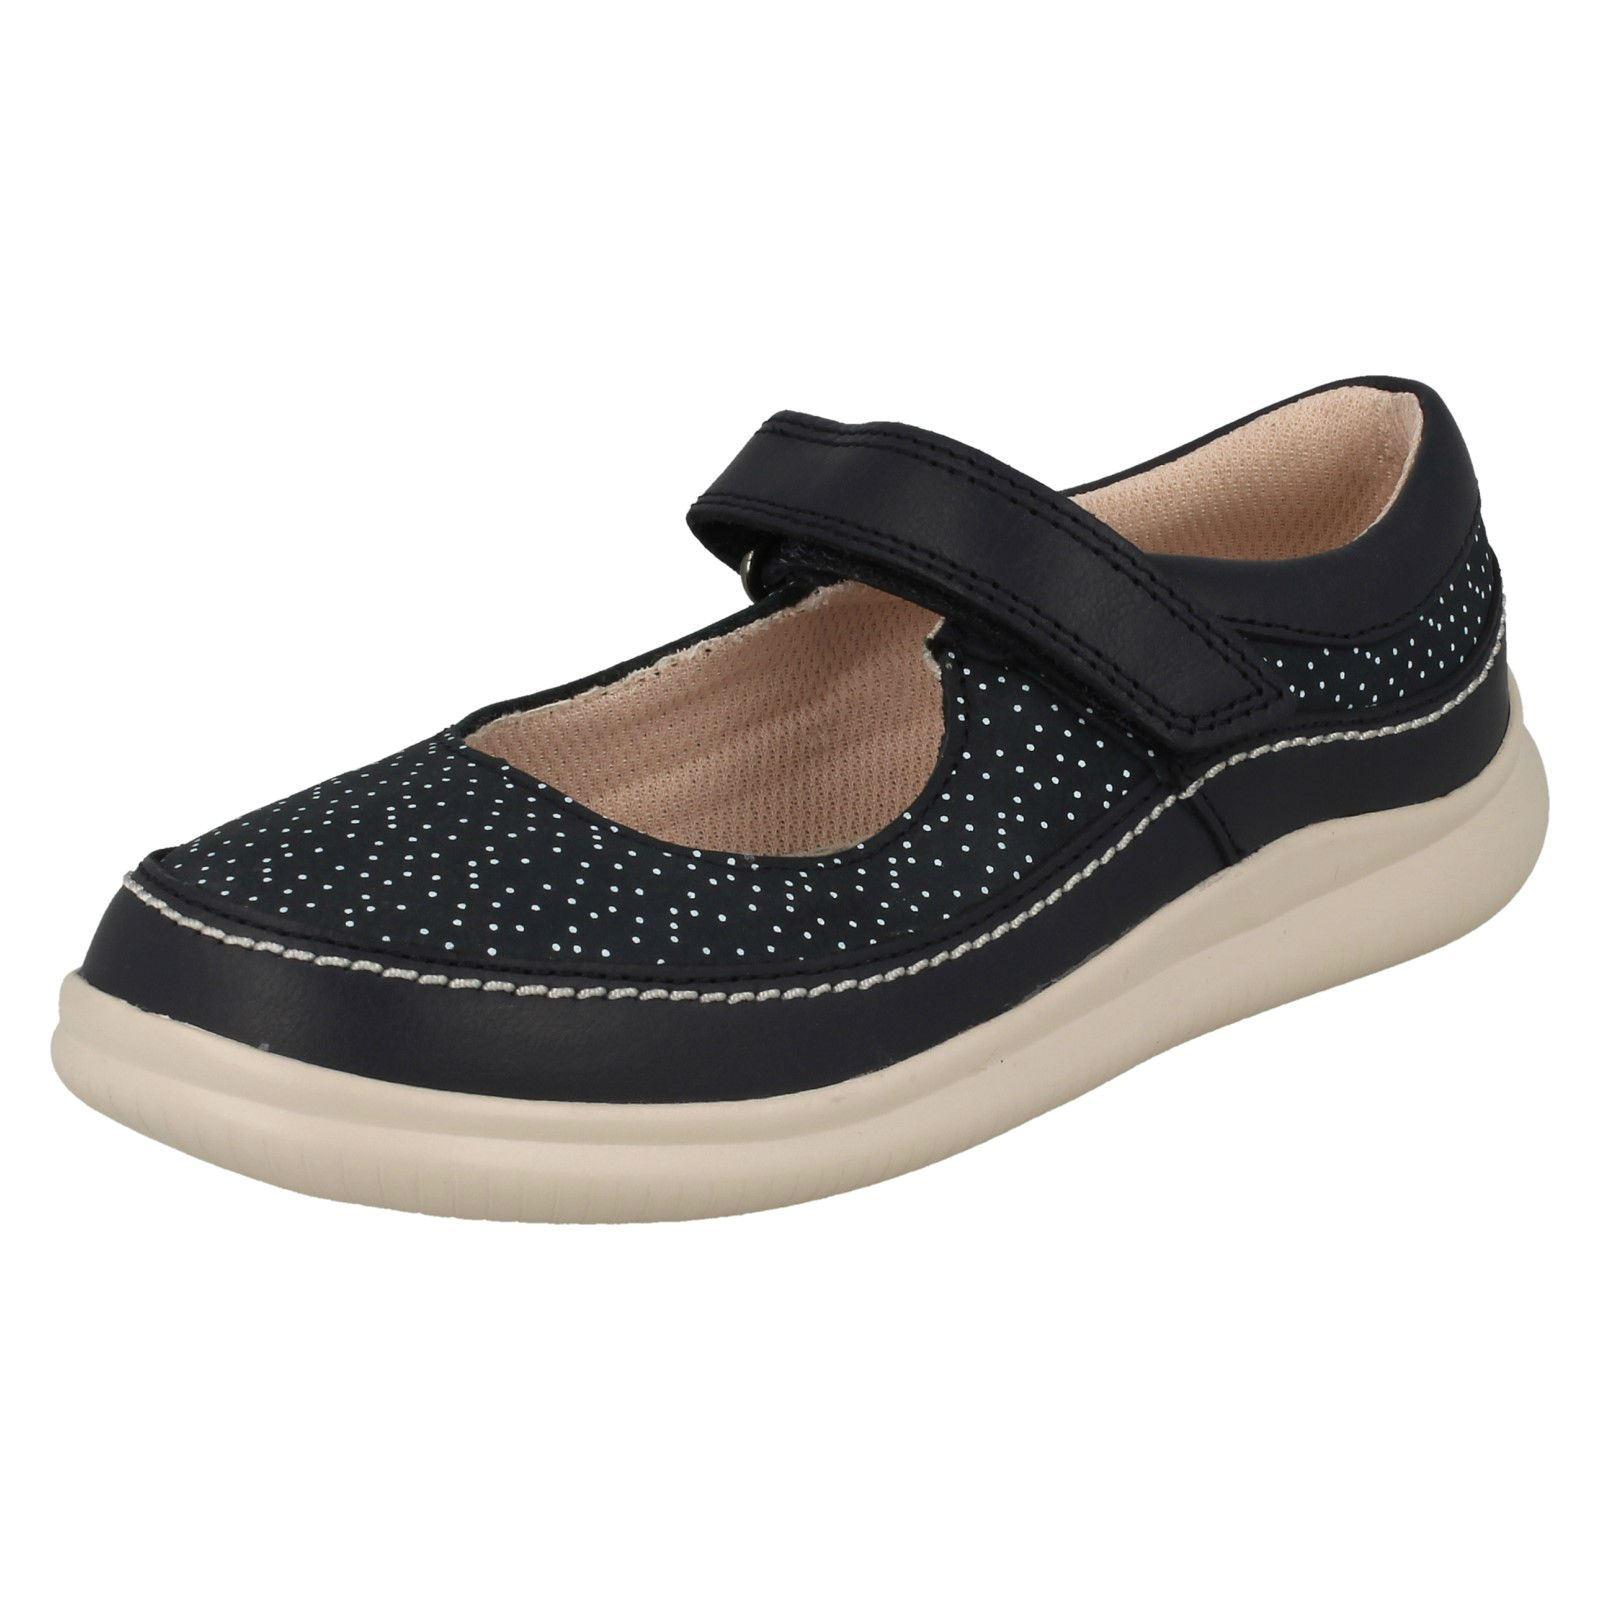 Niñas Fiesta Zapato Casual Cloud Navy Clarks azul rqRrOwHP